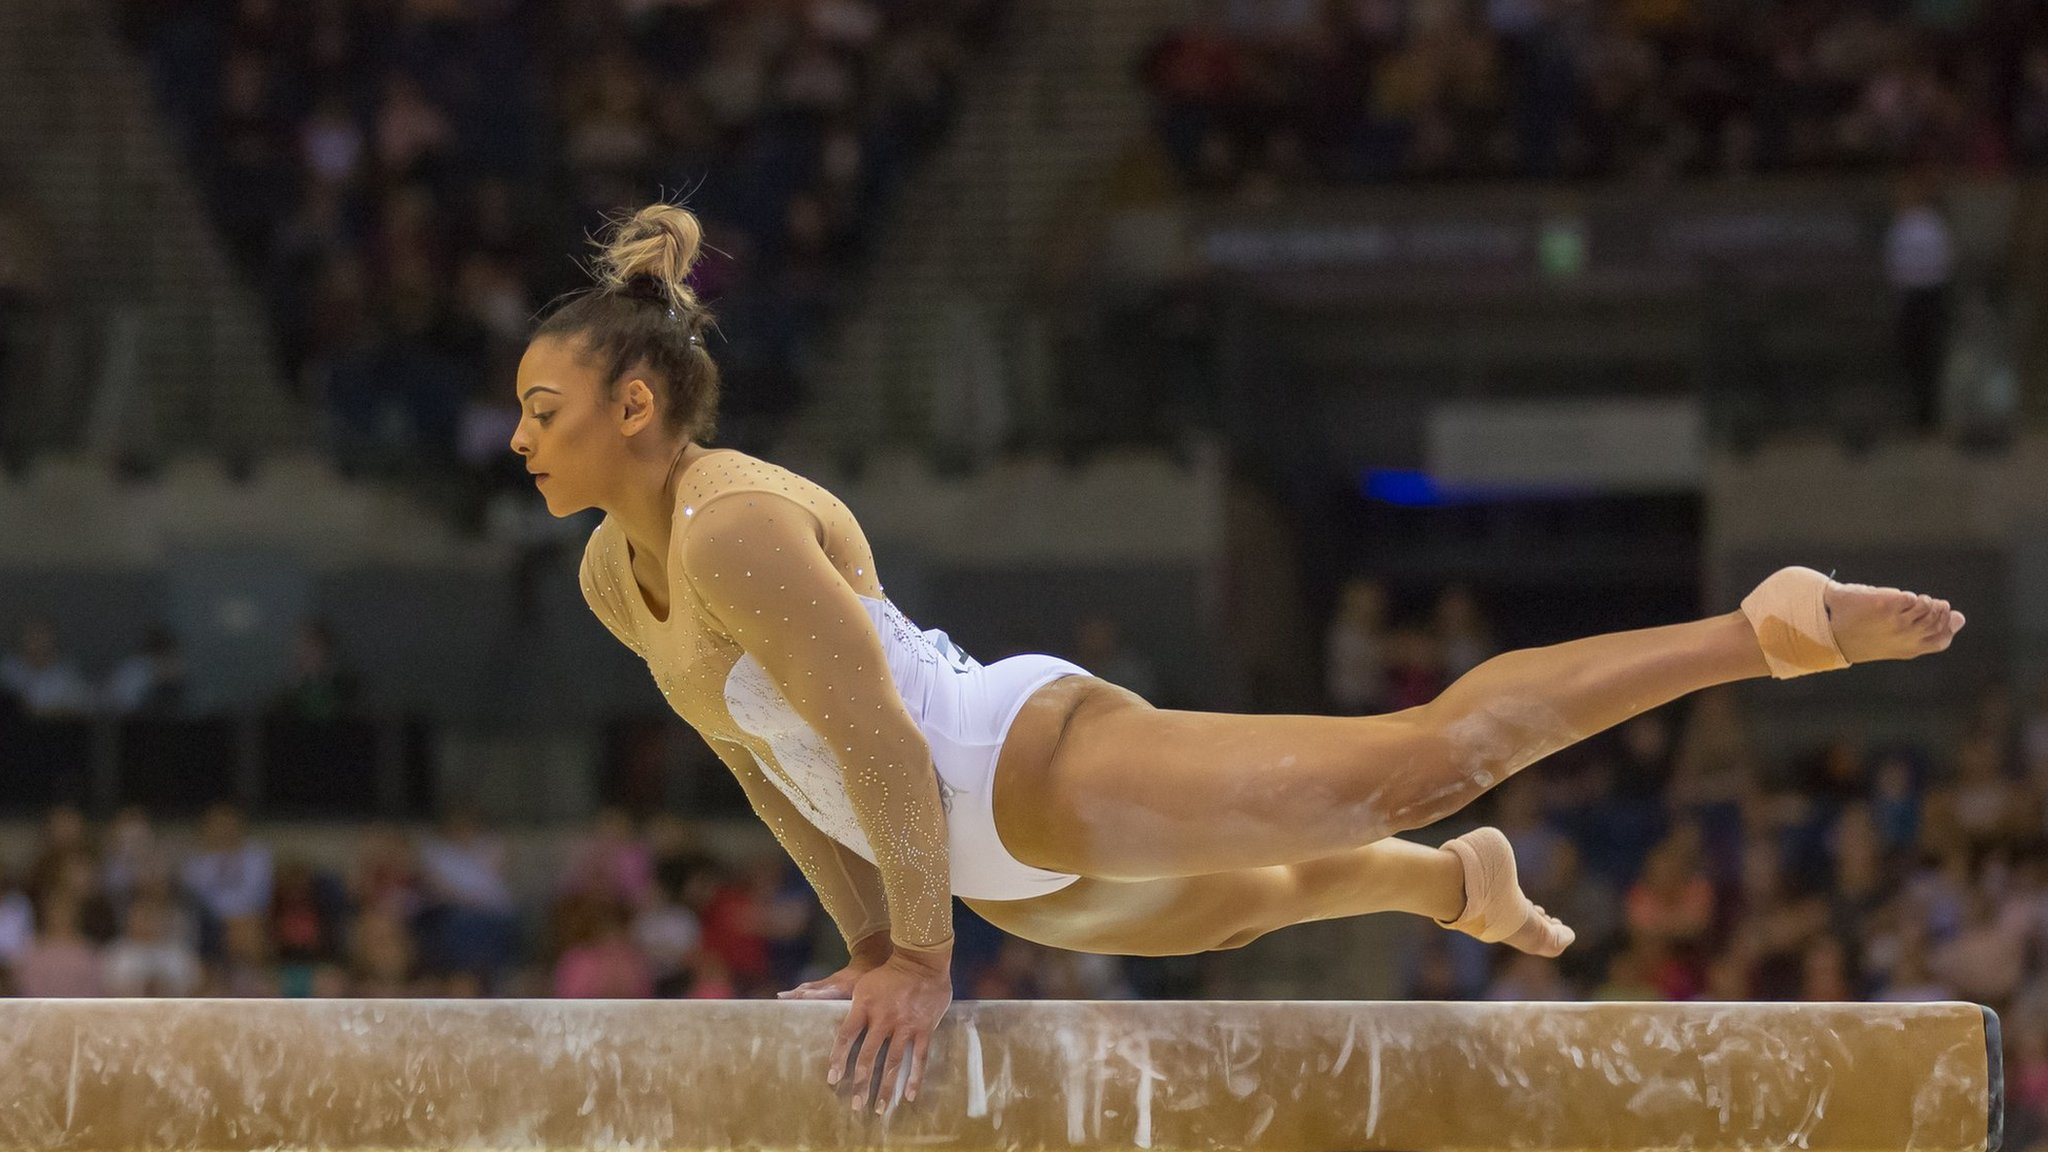 San Antonio teens represent Mexico at world gymnastics